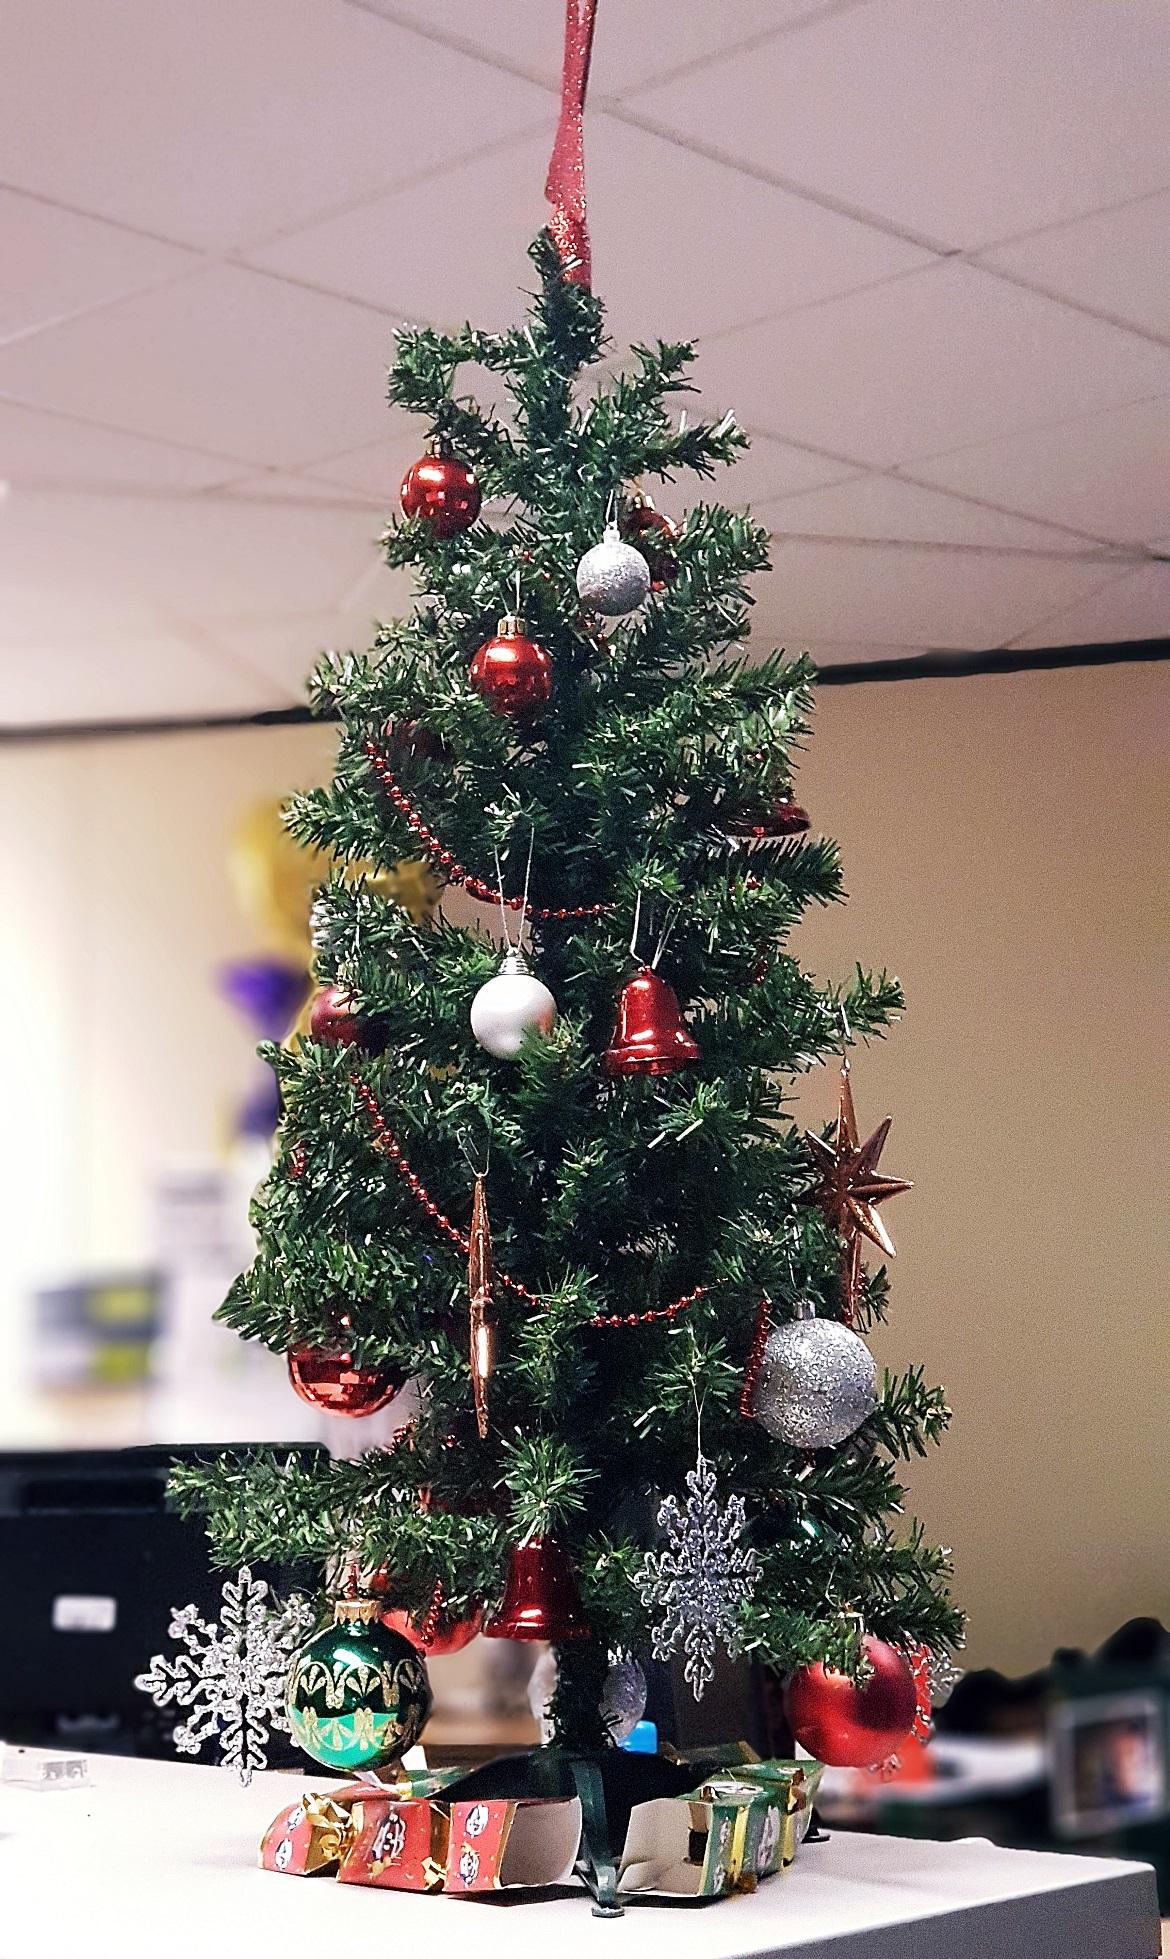 Work Christmas tree - December Monthly Recap by BeckyBecky Blogs